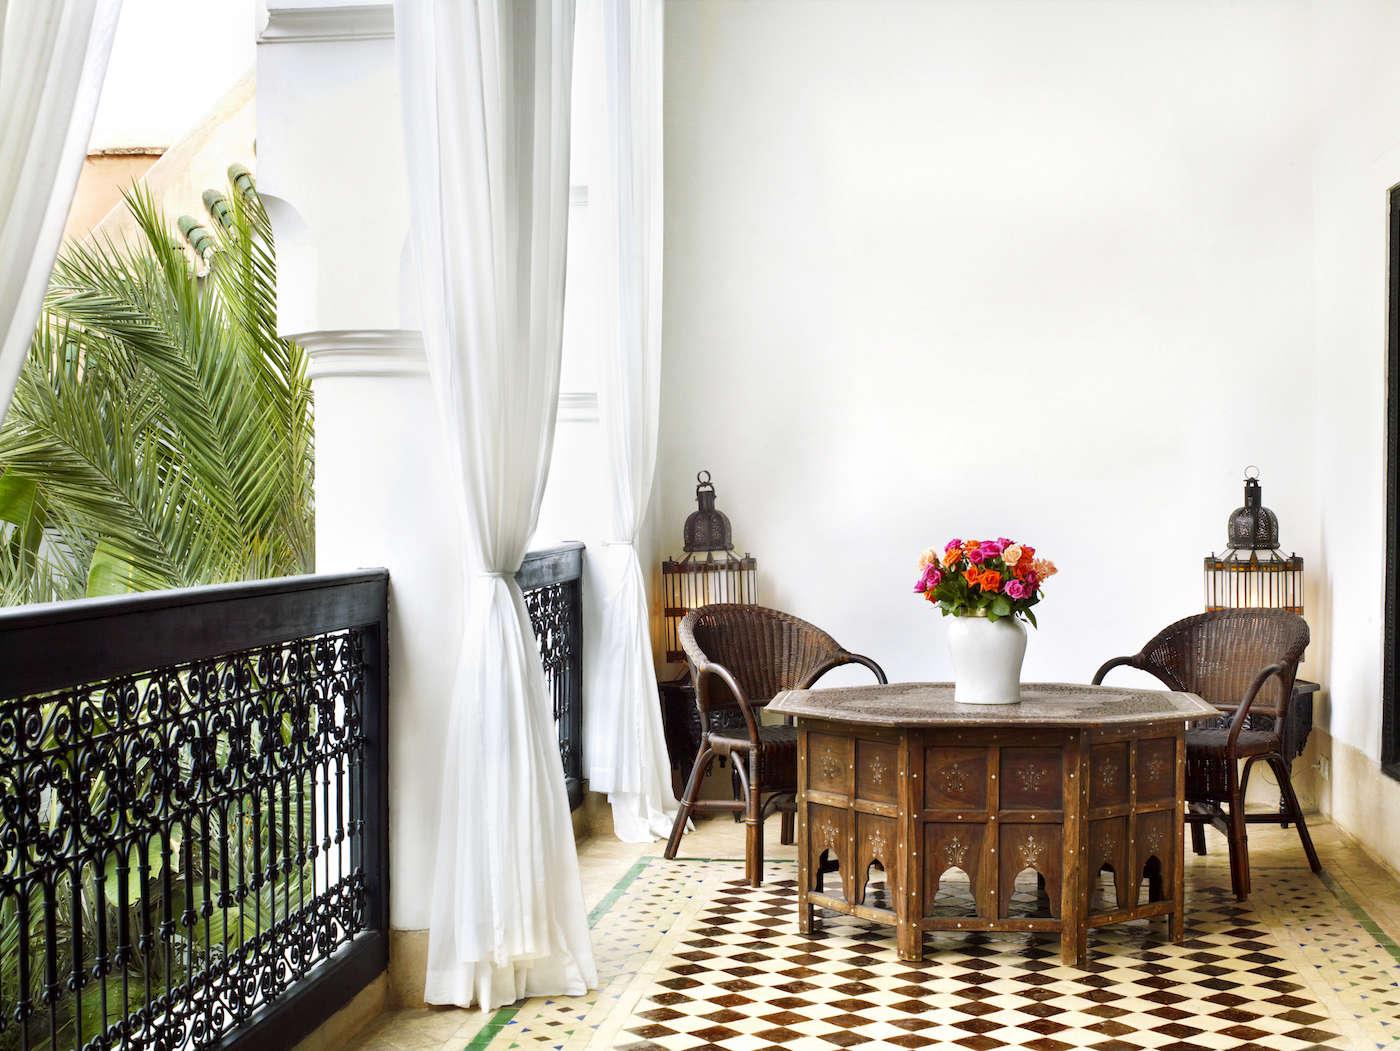 10 Garden Ideas to Steal From Morocco - Gardenista